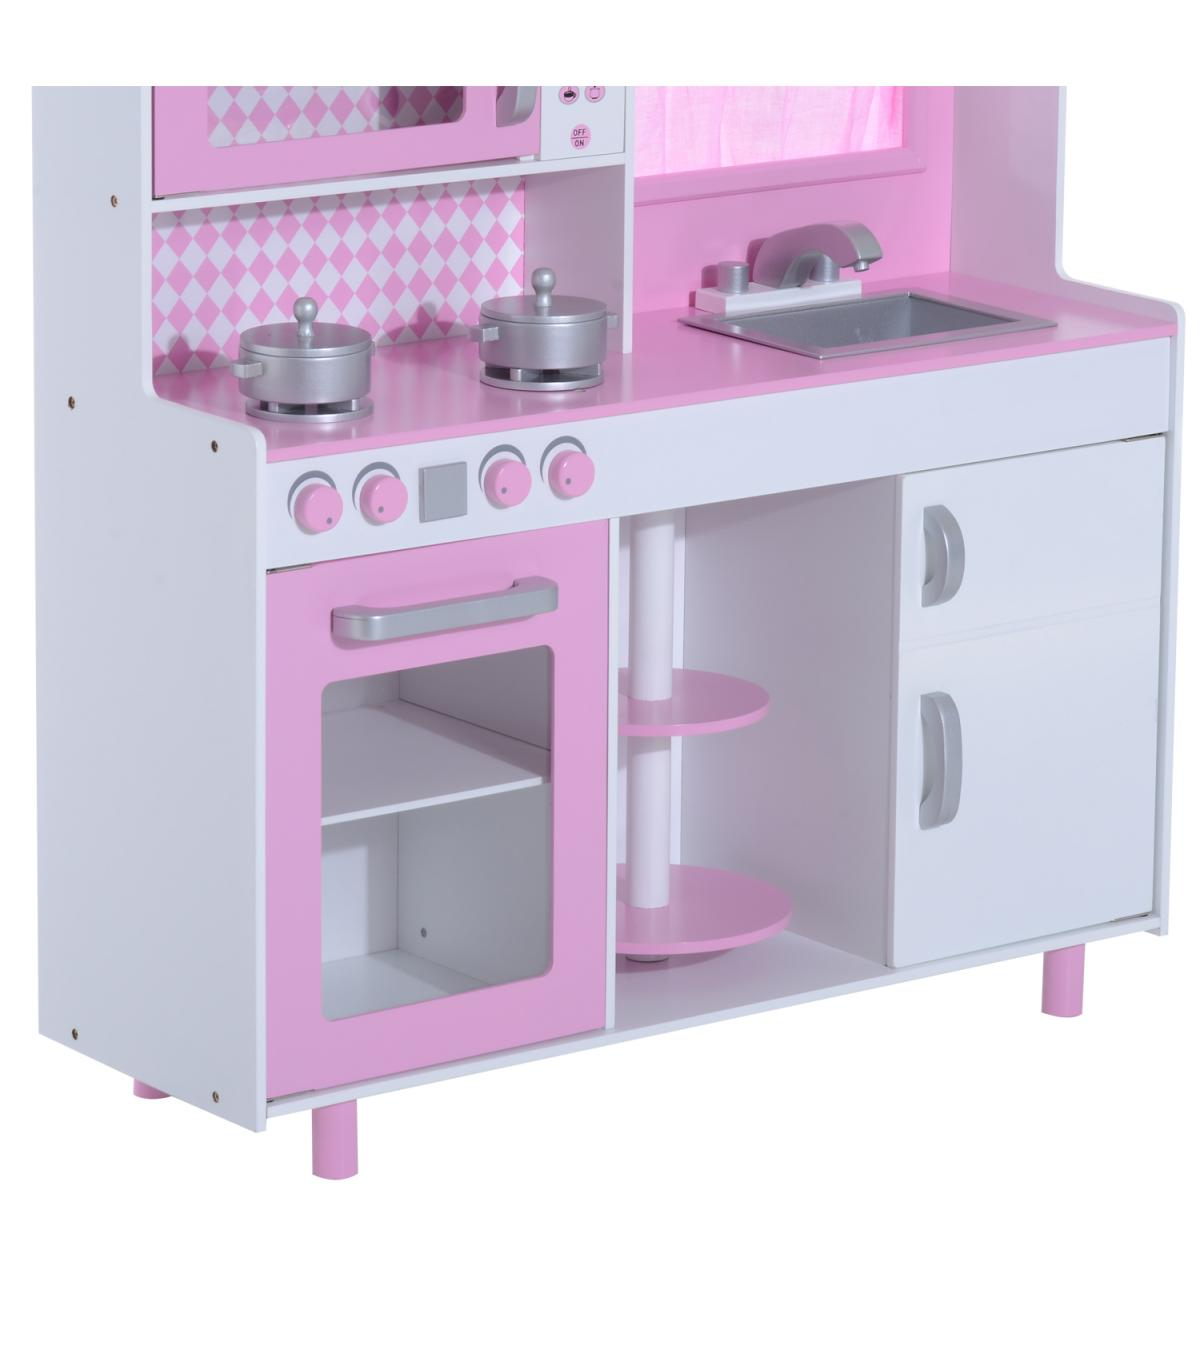 Cocina Madera 110x32 Niños3 5cm 5x99 Años Homcom® Juguete Para Rosa u31JlKcTF5